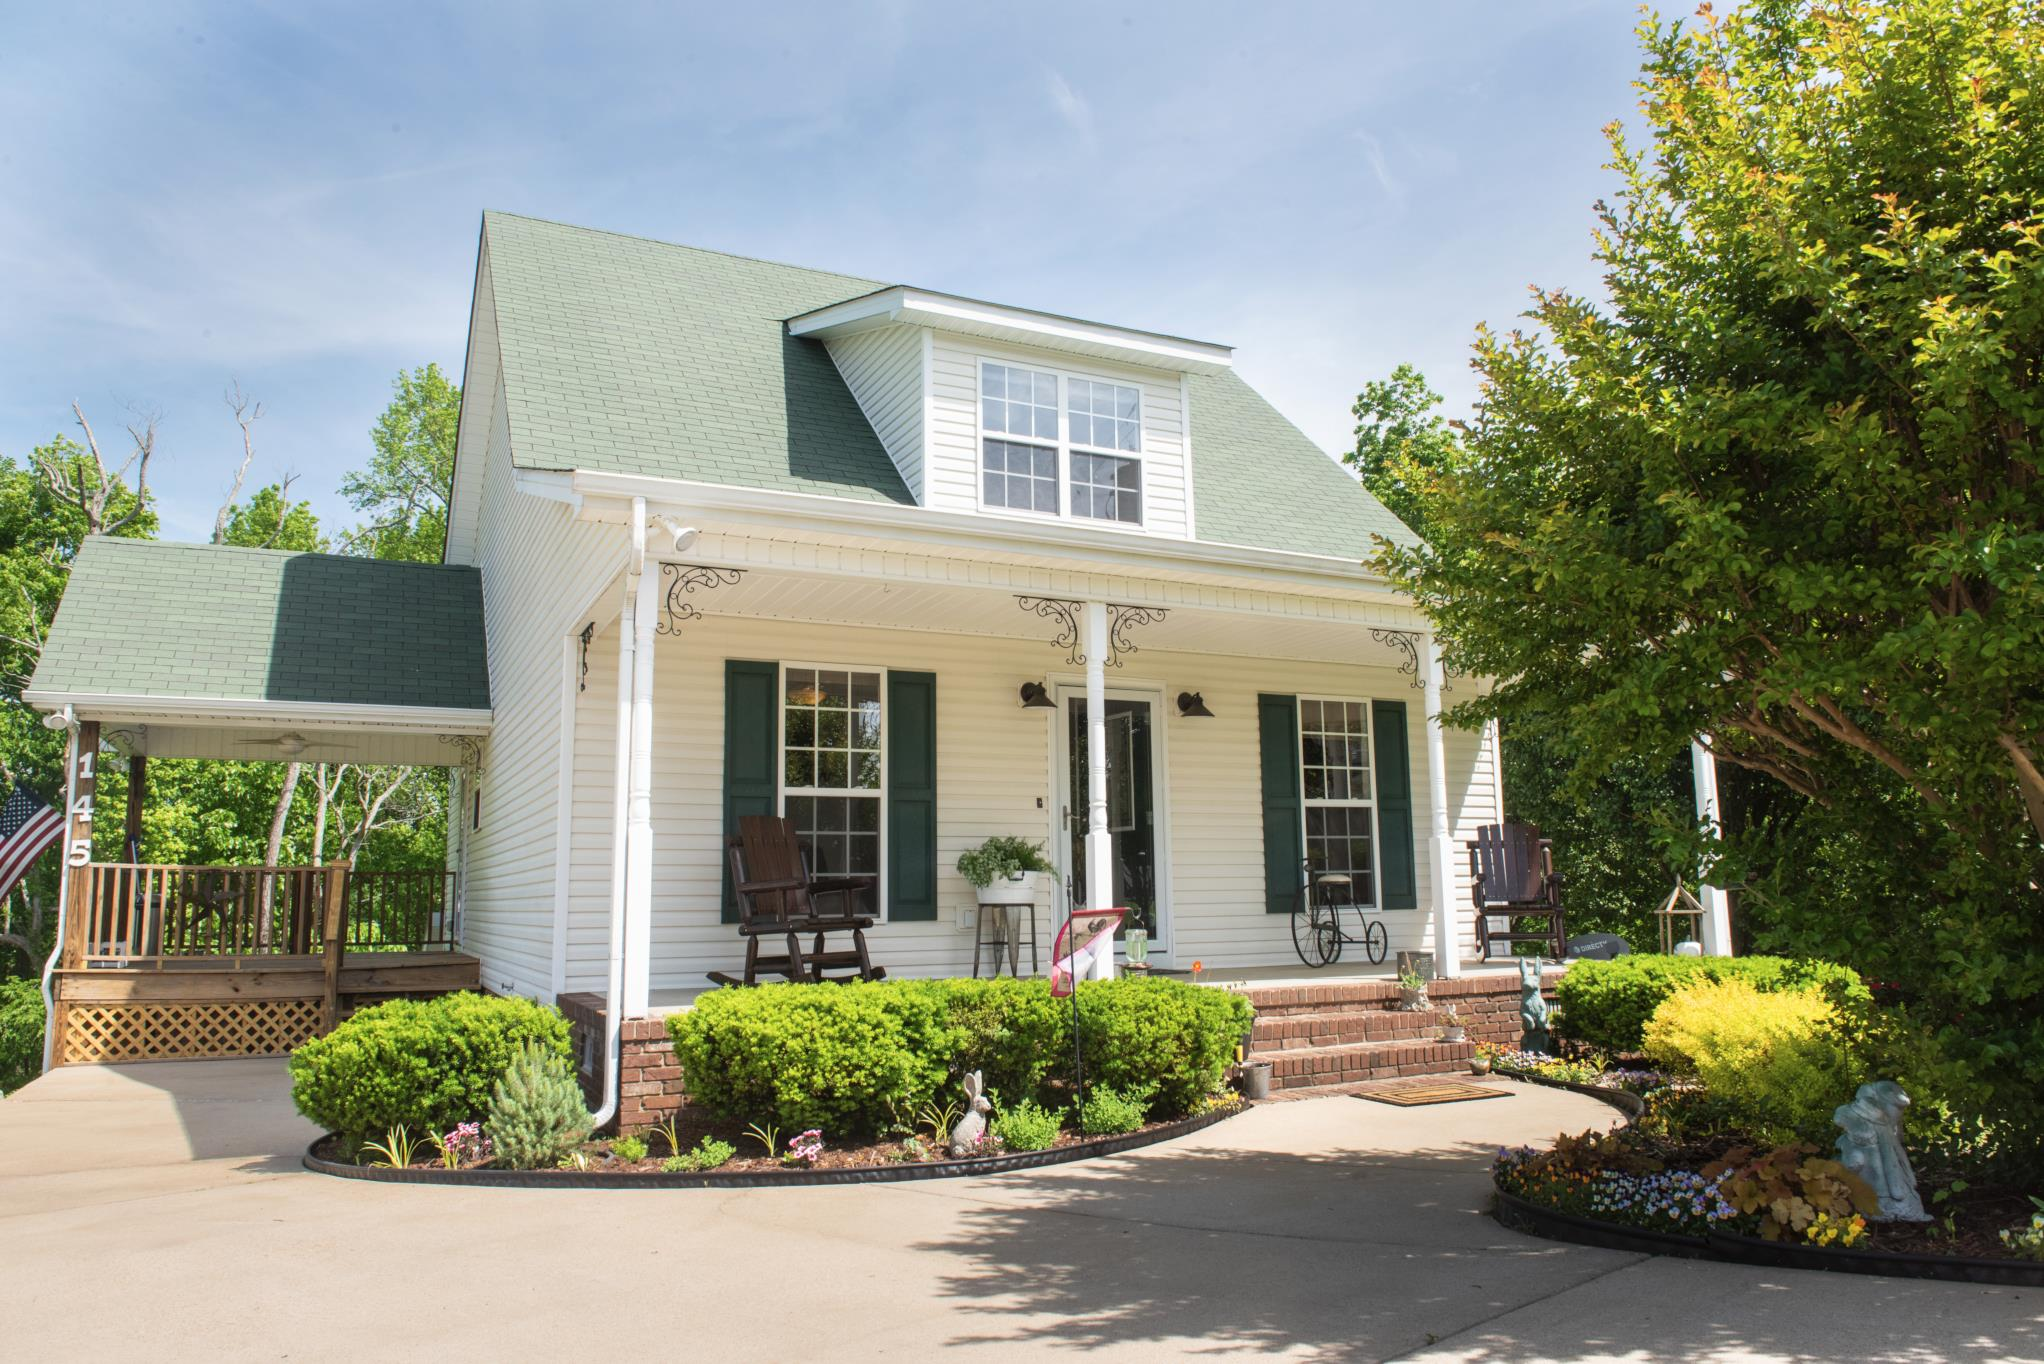 145 Eastridge Dr, Pulaski, TN 38478 - Pulaski, TN real estate listing